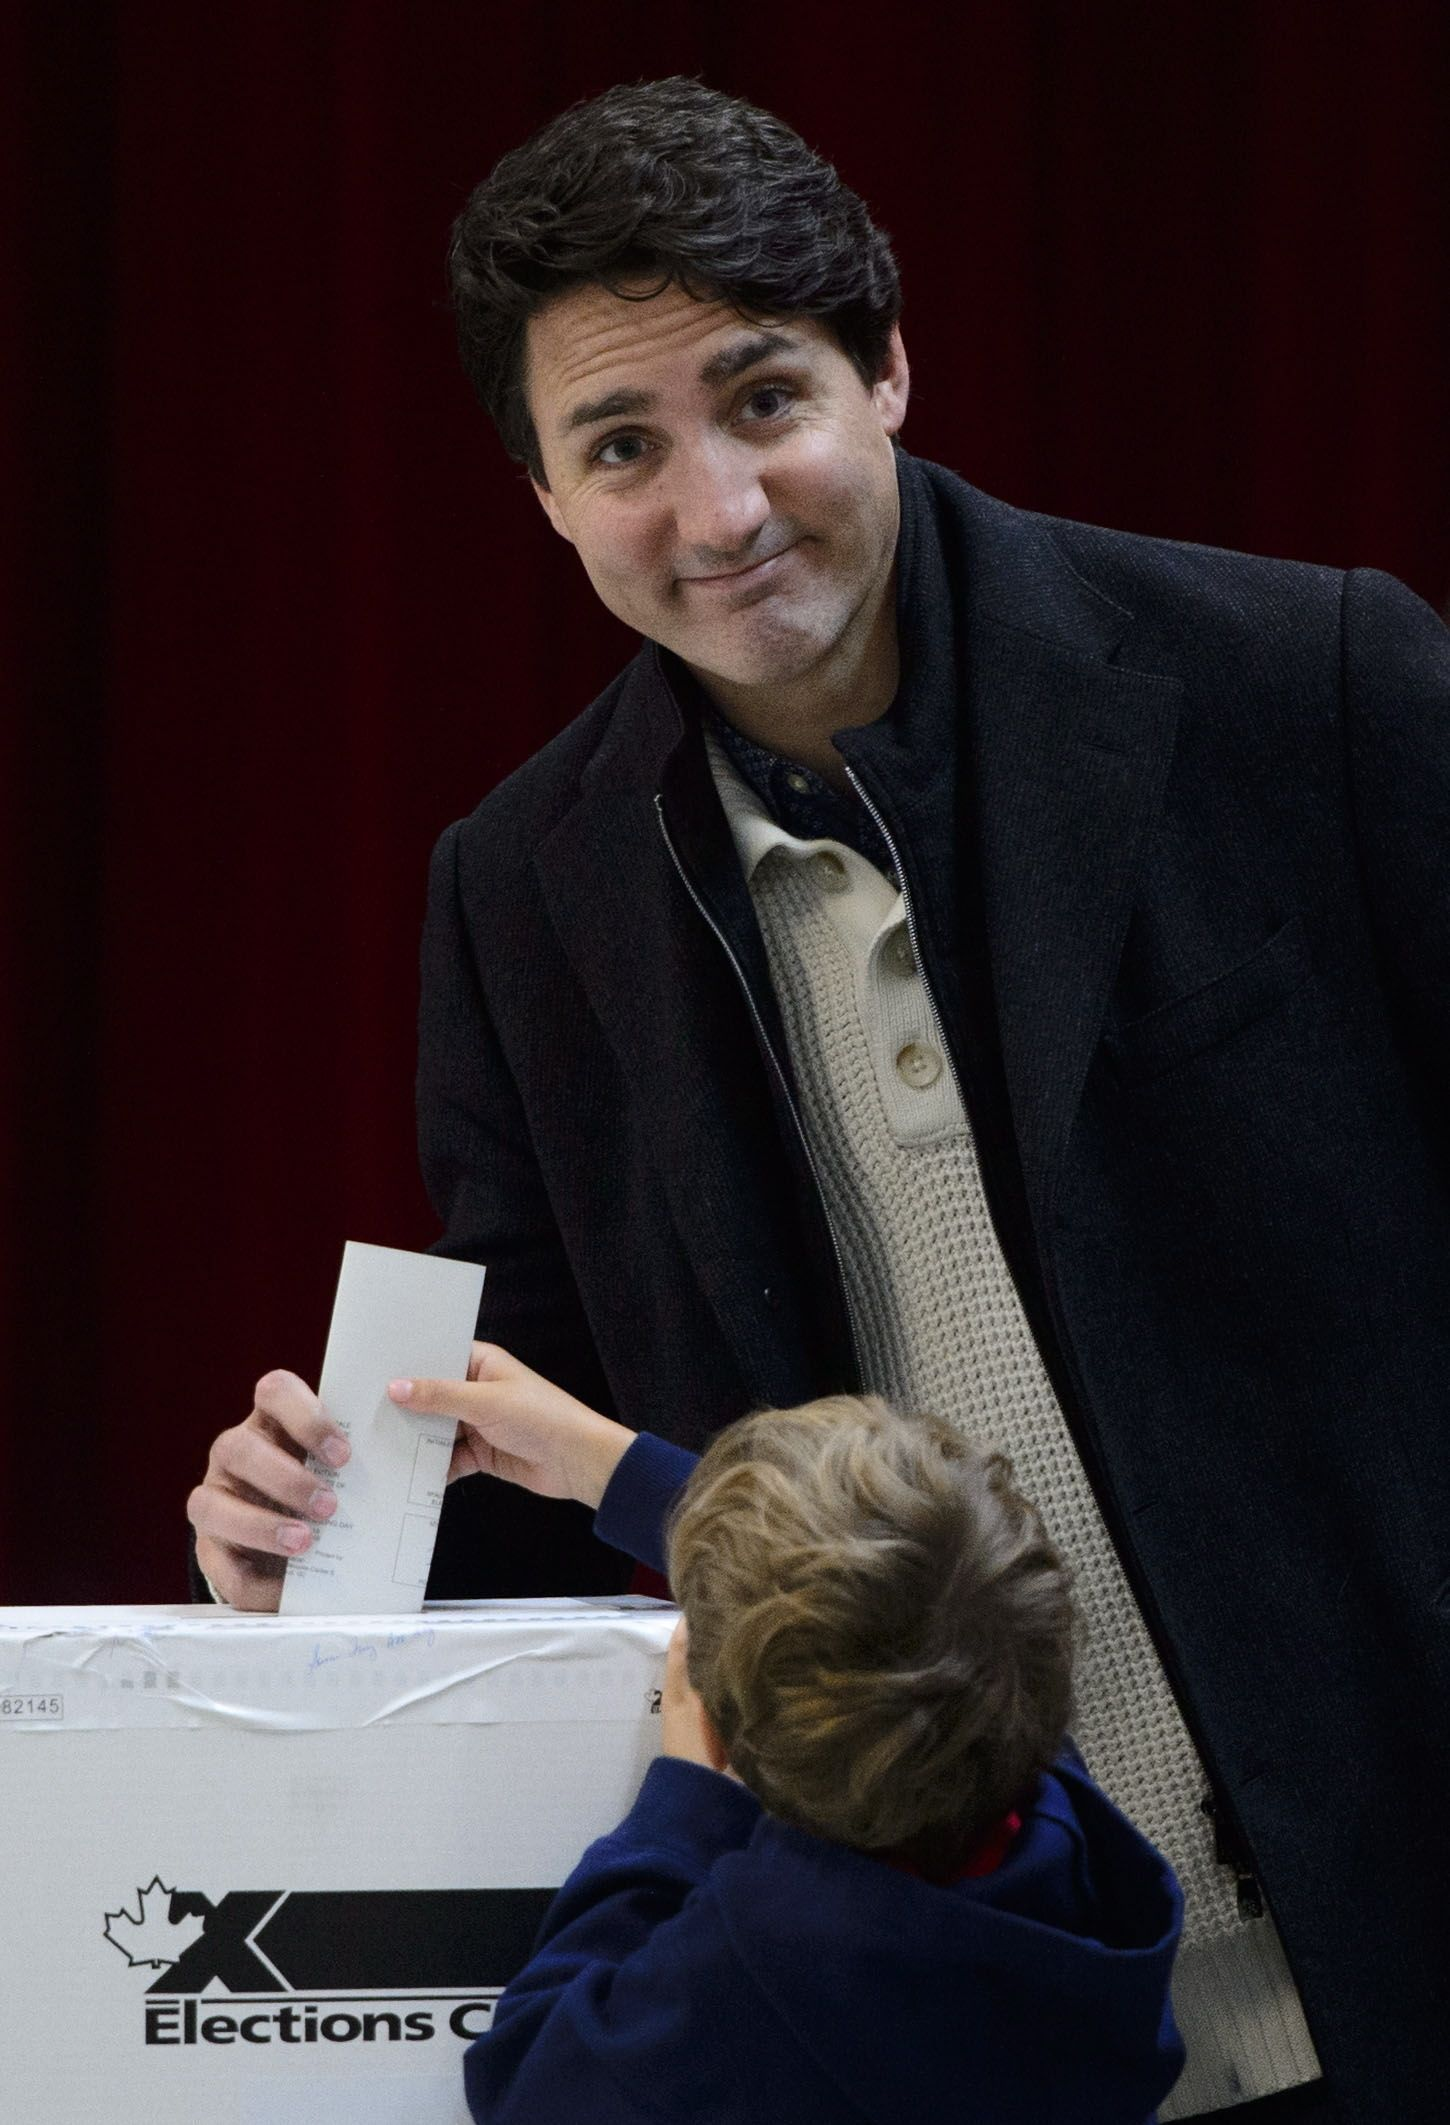 Wahlen in Kanada Justin Trudeau